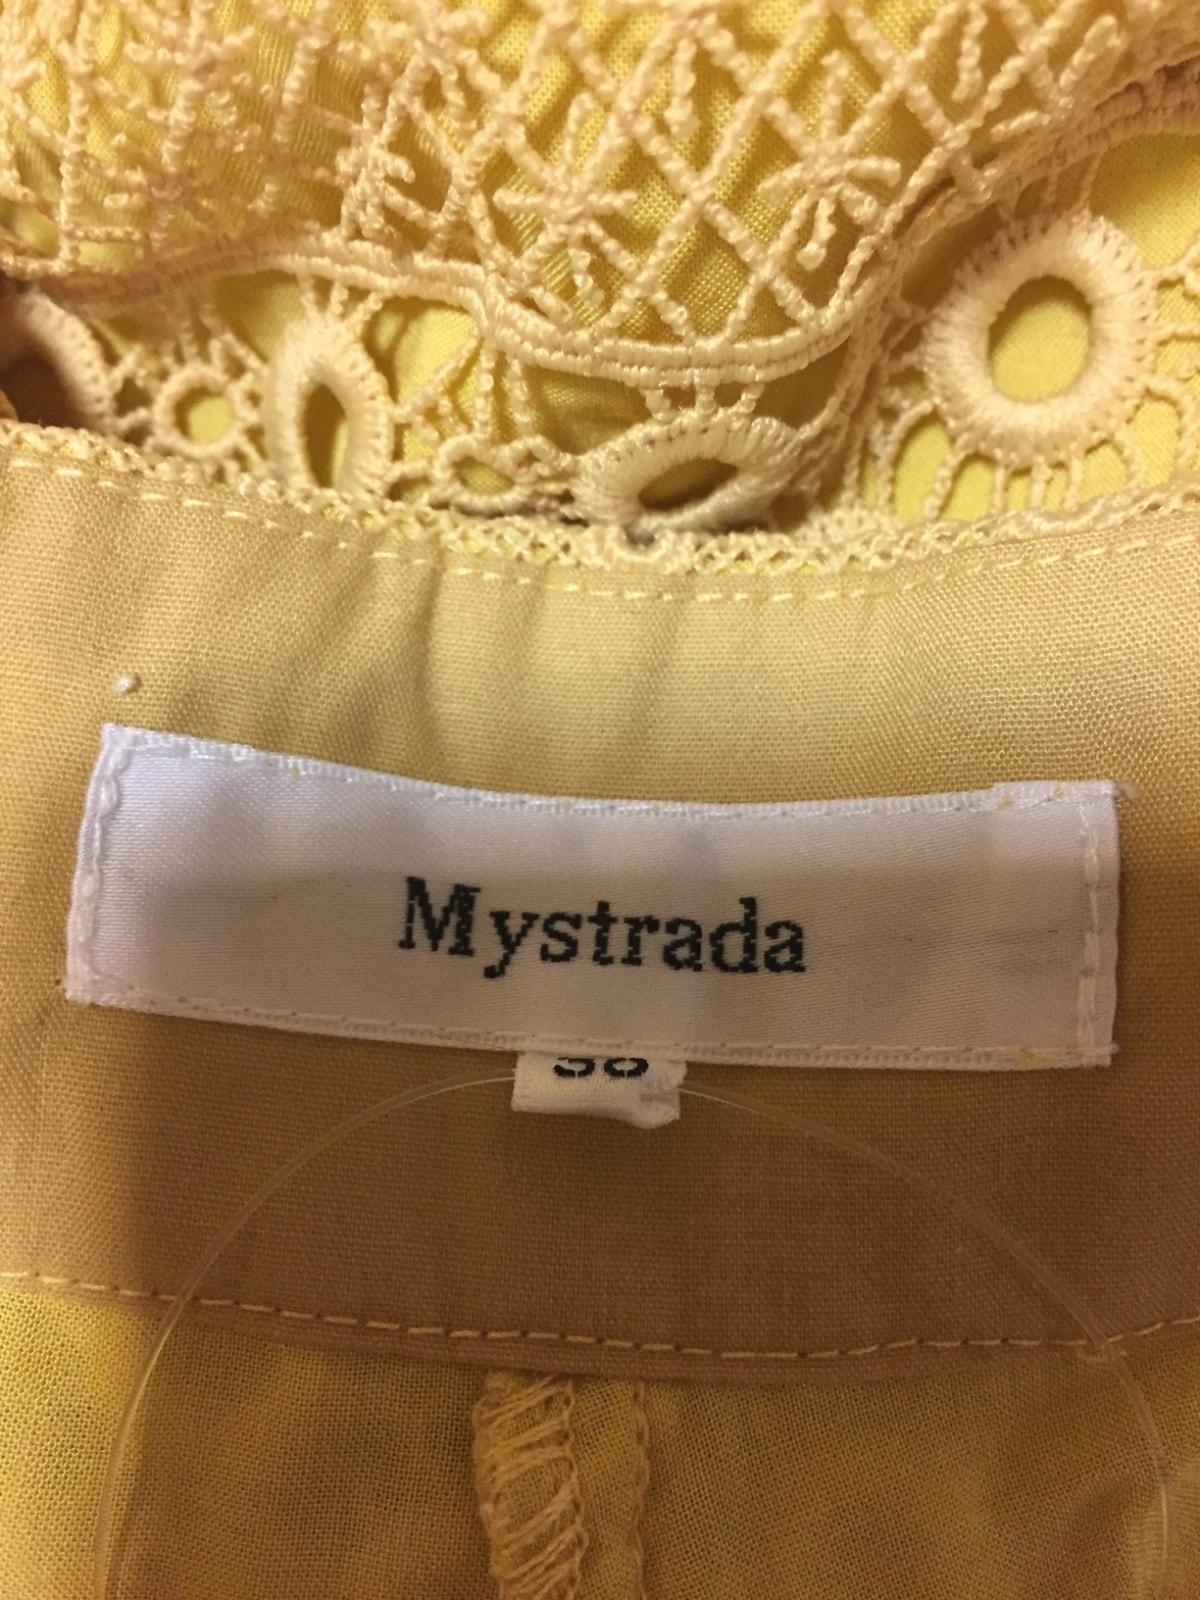 Mystrada(マイストラーダ)のパンツ